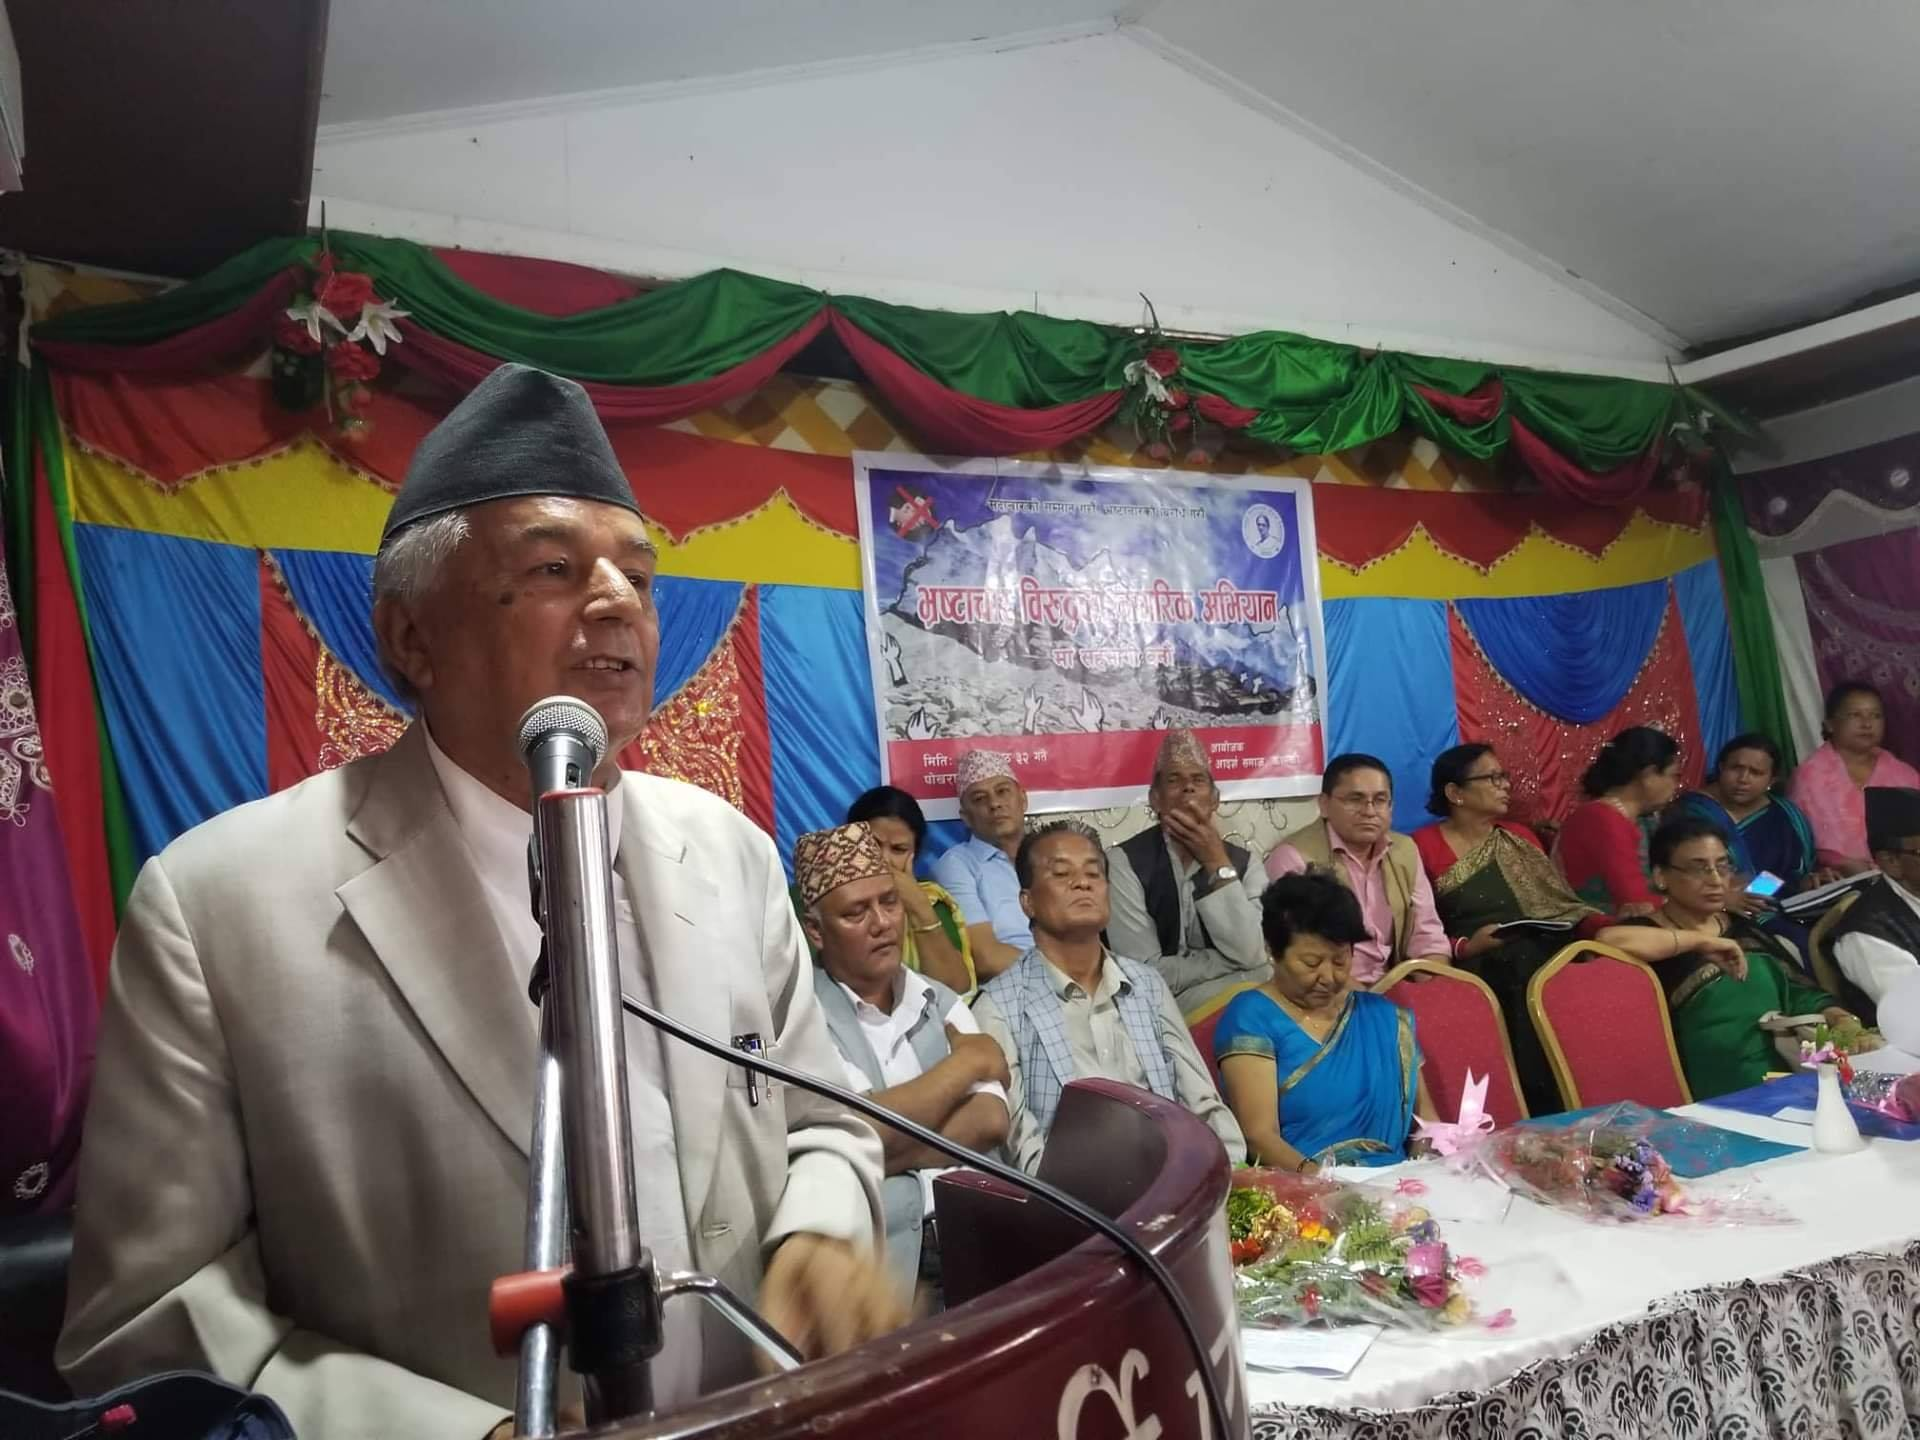 भ्रष्टाचारका कारण राजनीतिप्रति जनताको वितृष्णा बढ्योः बरिष्ठ नेता पौडेल